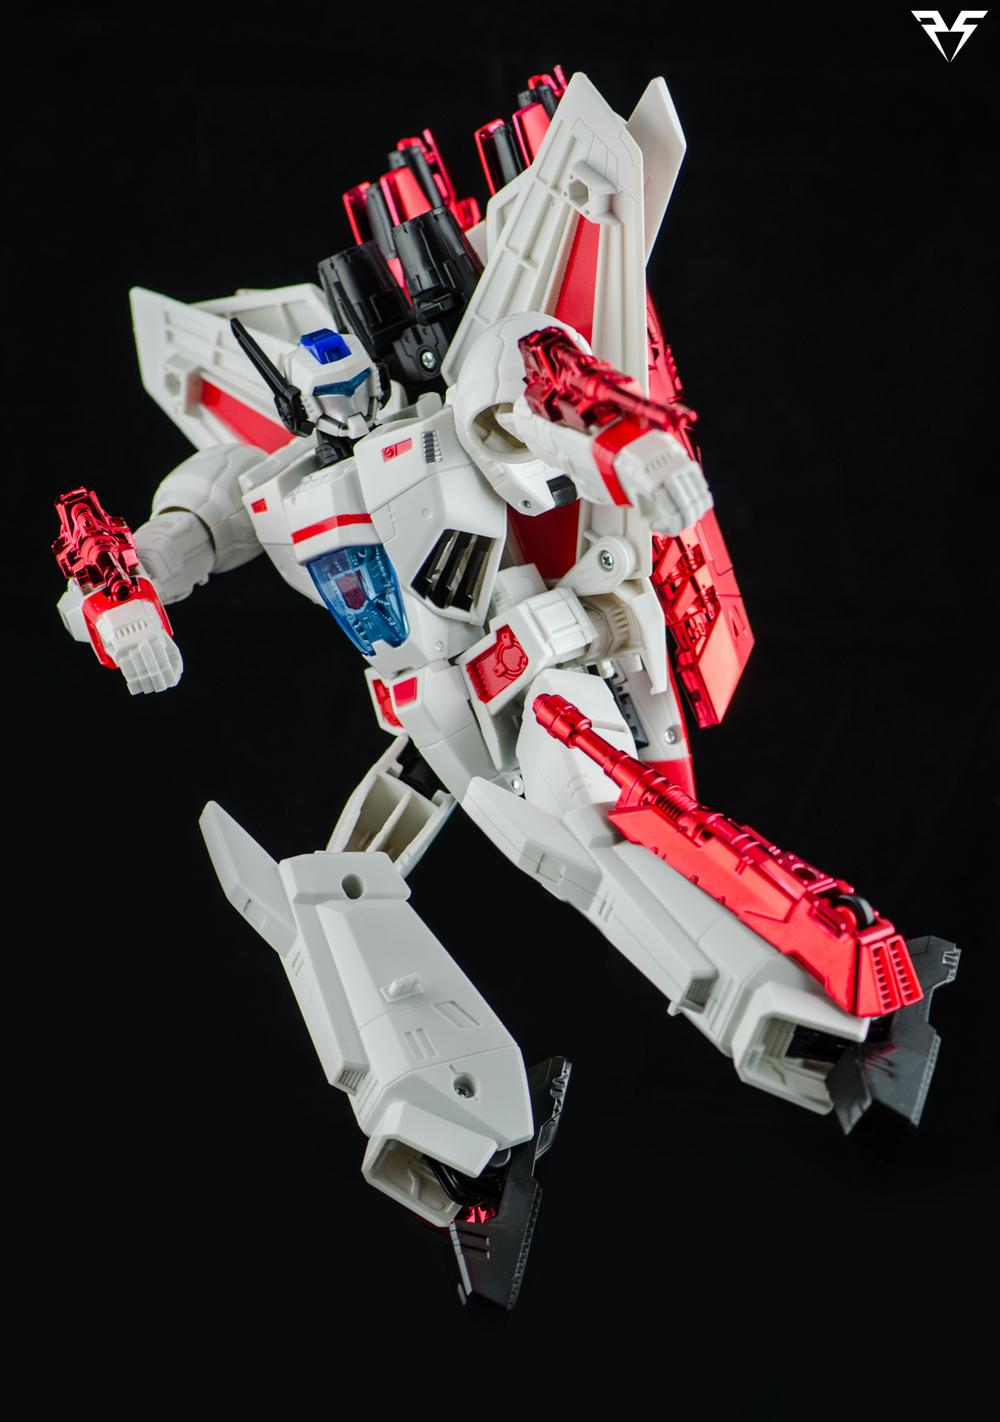 Jetfire-Attack02.jpg